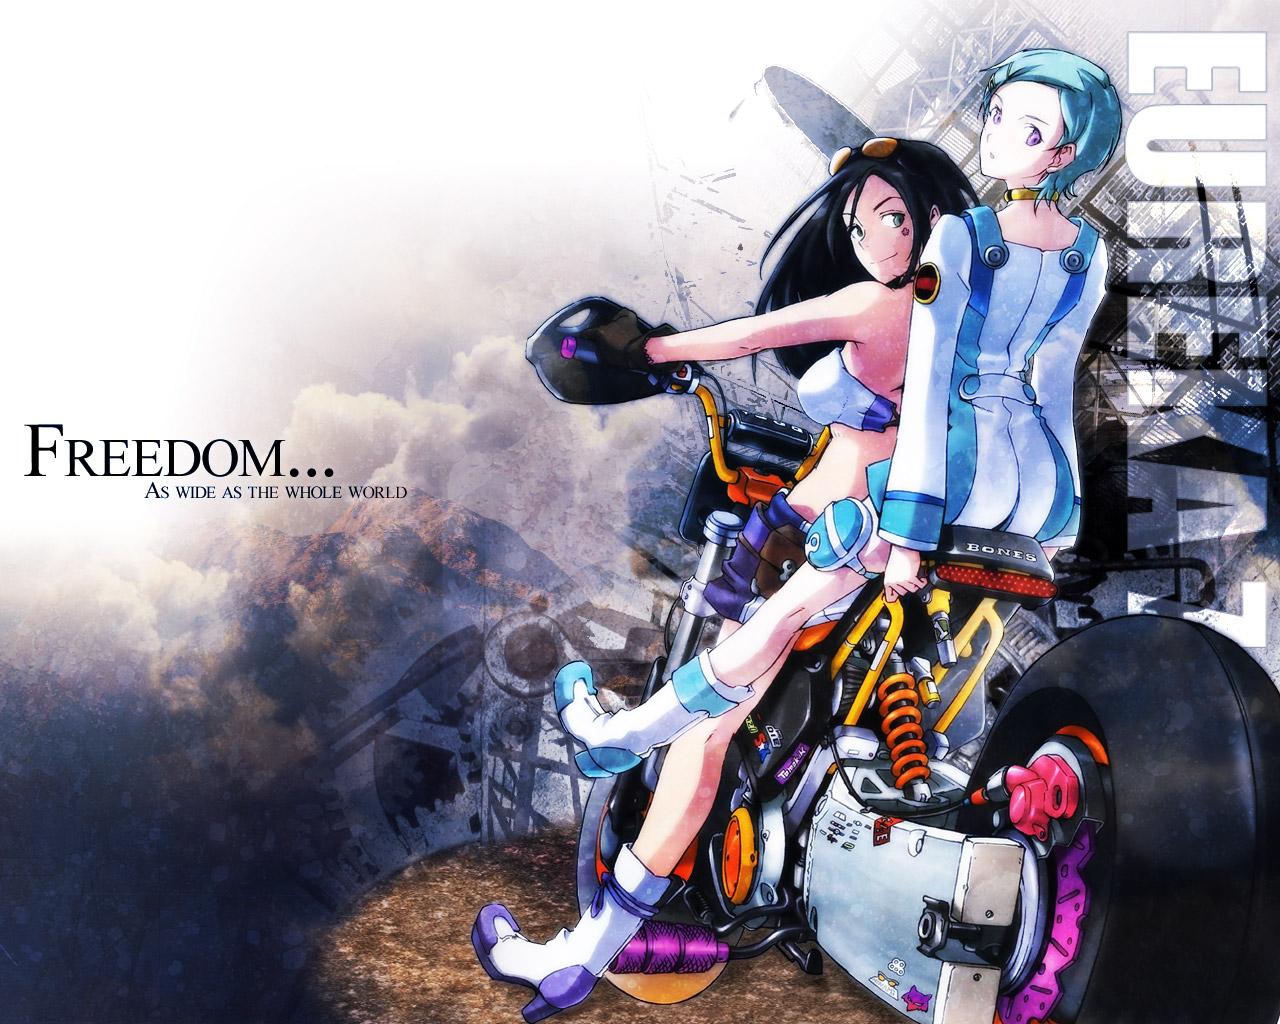 eureka eureka_seven motorcycle talho_yuuki